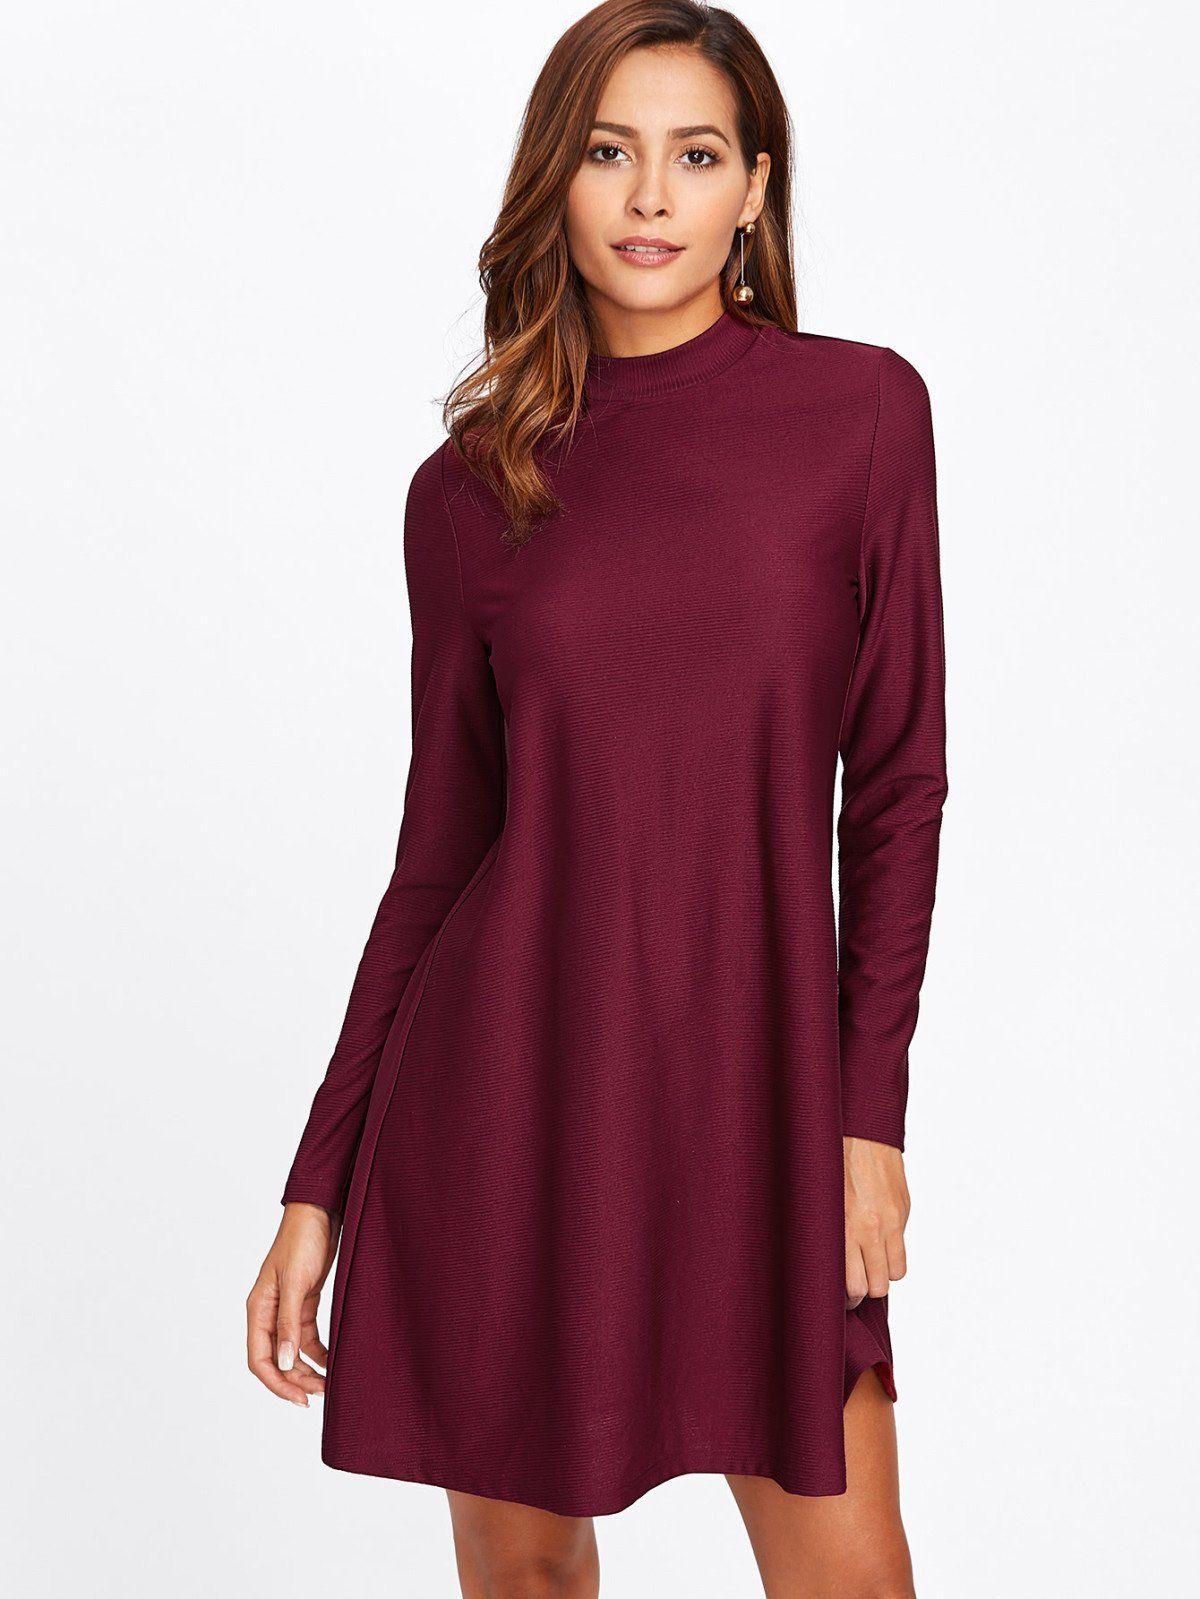 Zipper back ribbed swing dress swings casual wear and sleeved dress